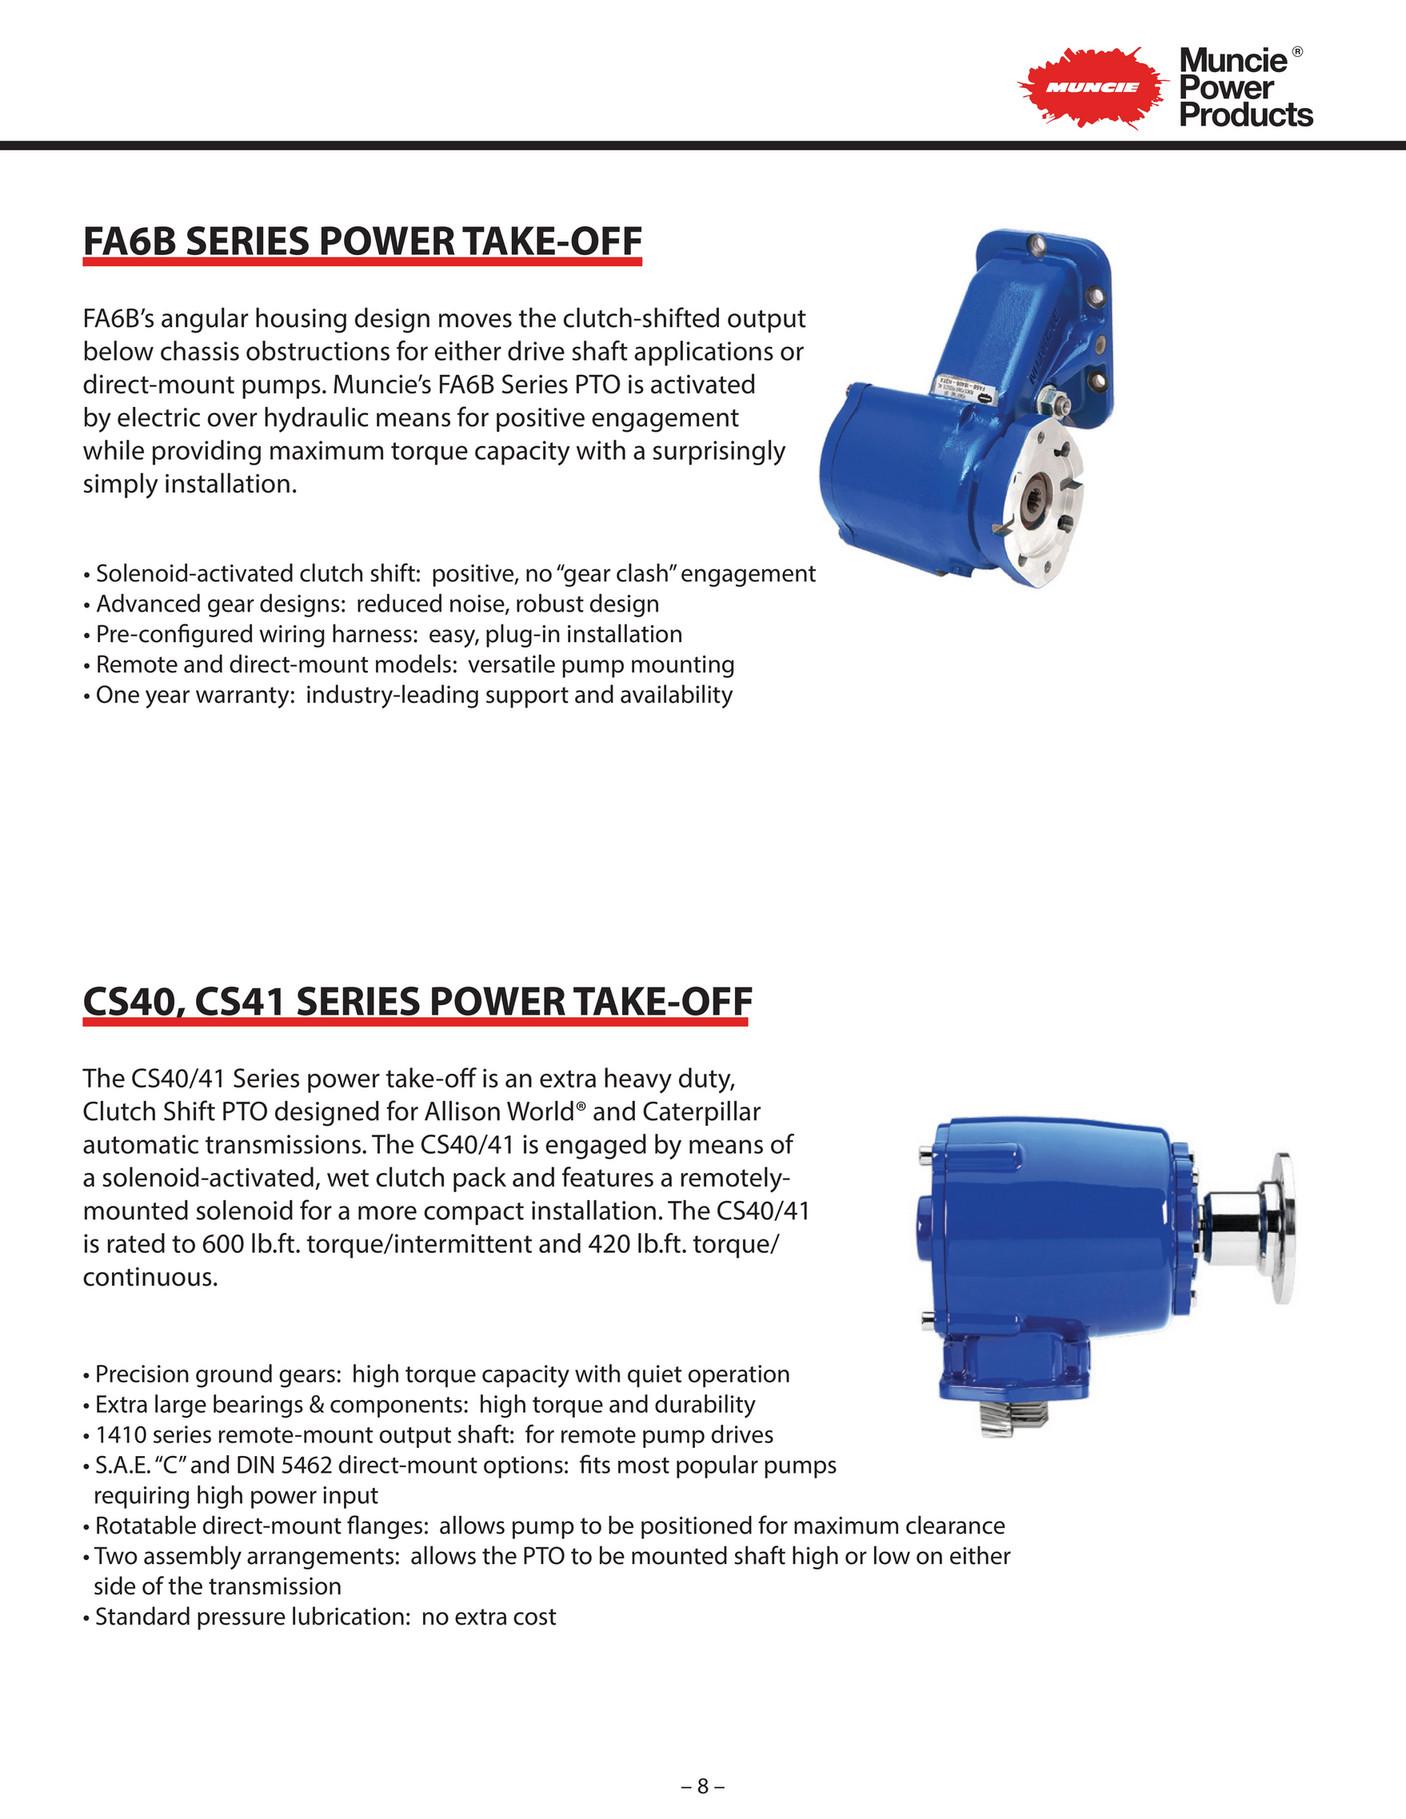 R&M Equipment - Muncie Auxiliary Power Brochure v1 - Page 10 ... on muncie hydraulic clutch kits, muncie parts, muncie transmission, muncie hydraulic electric shift wiring,